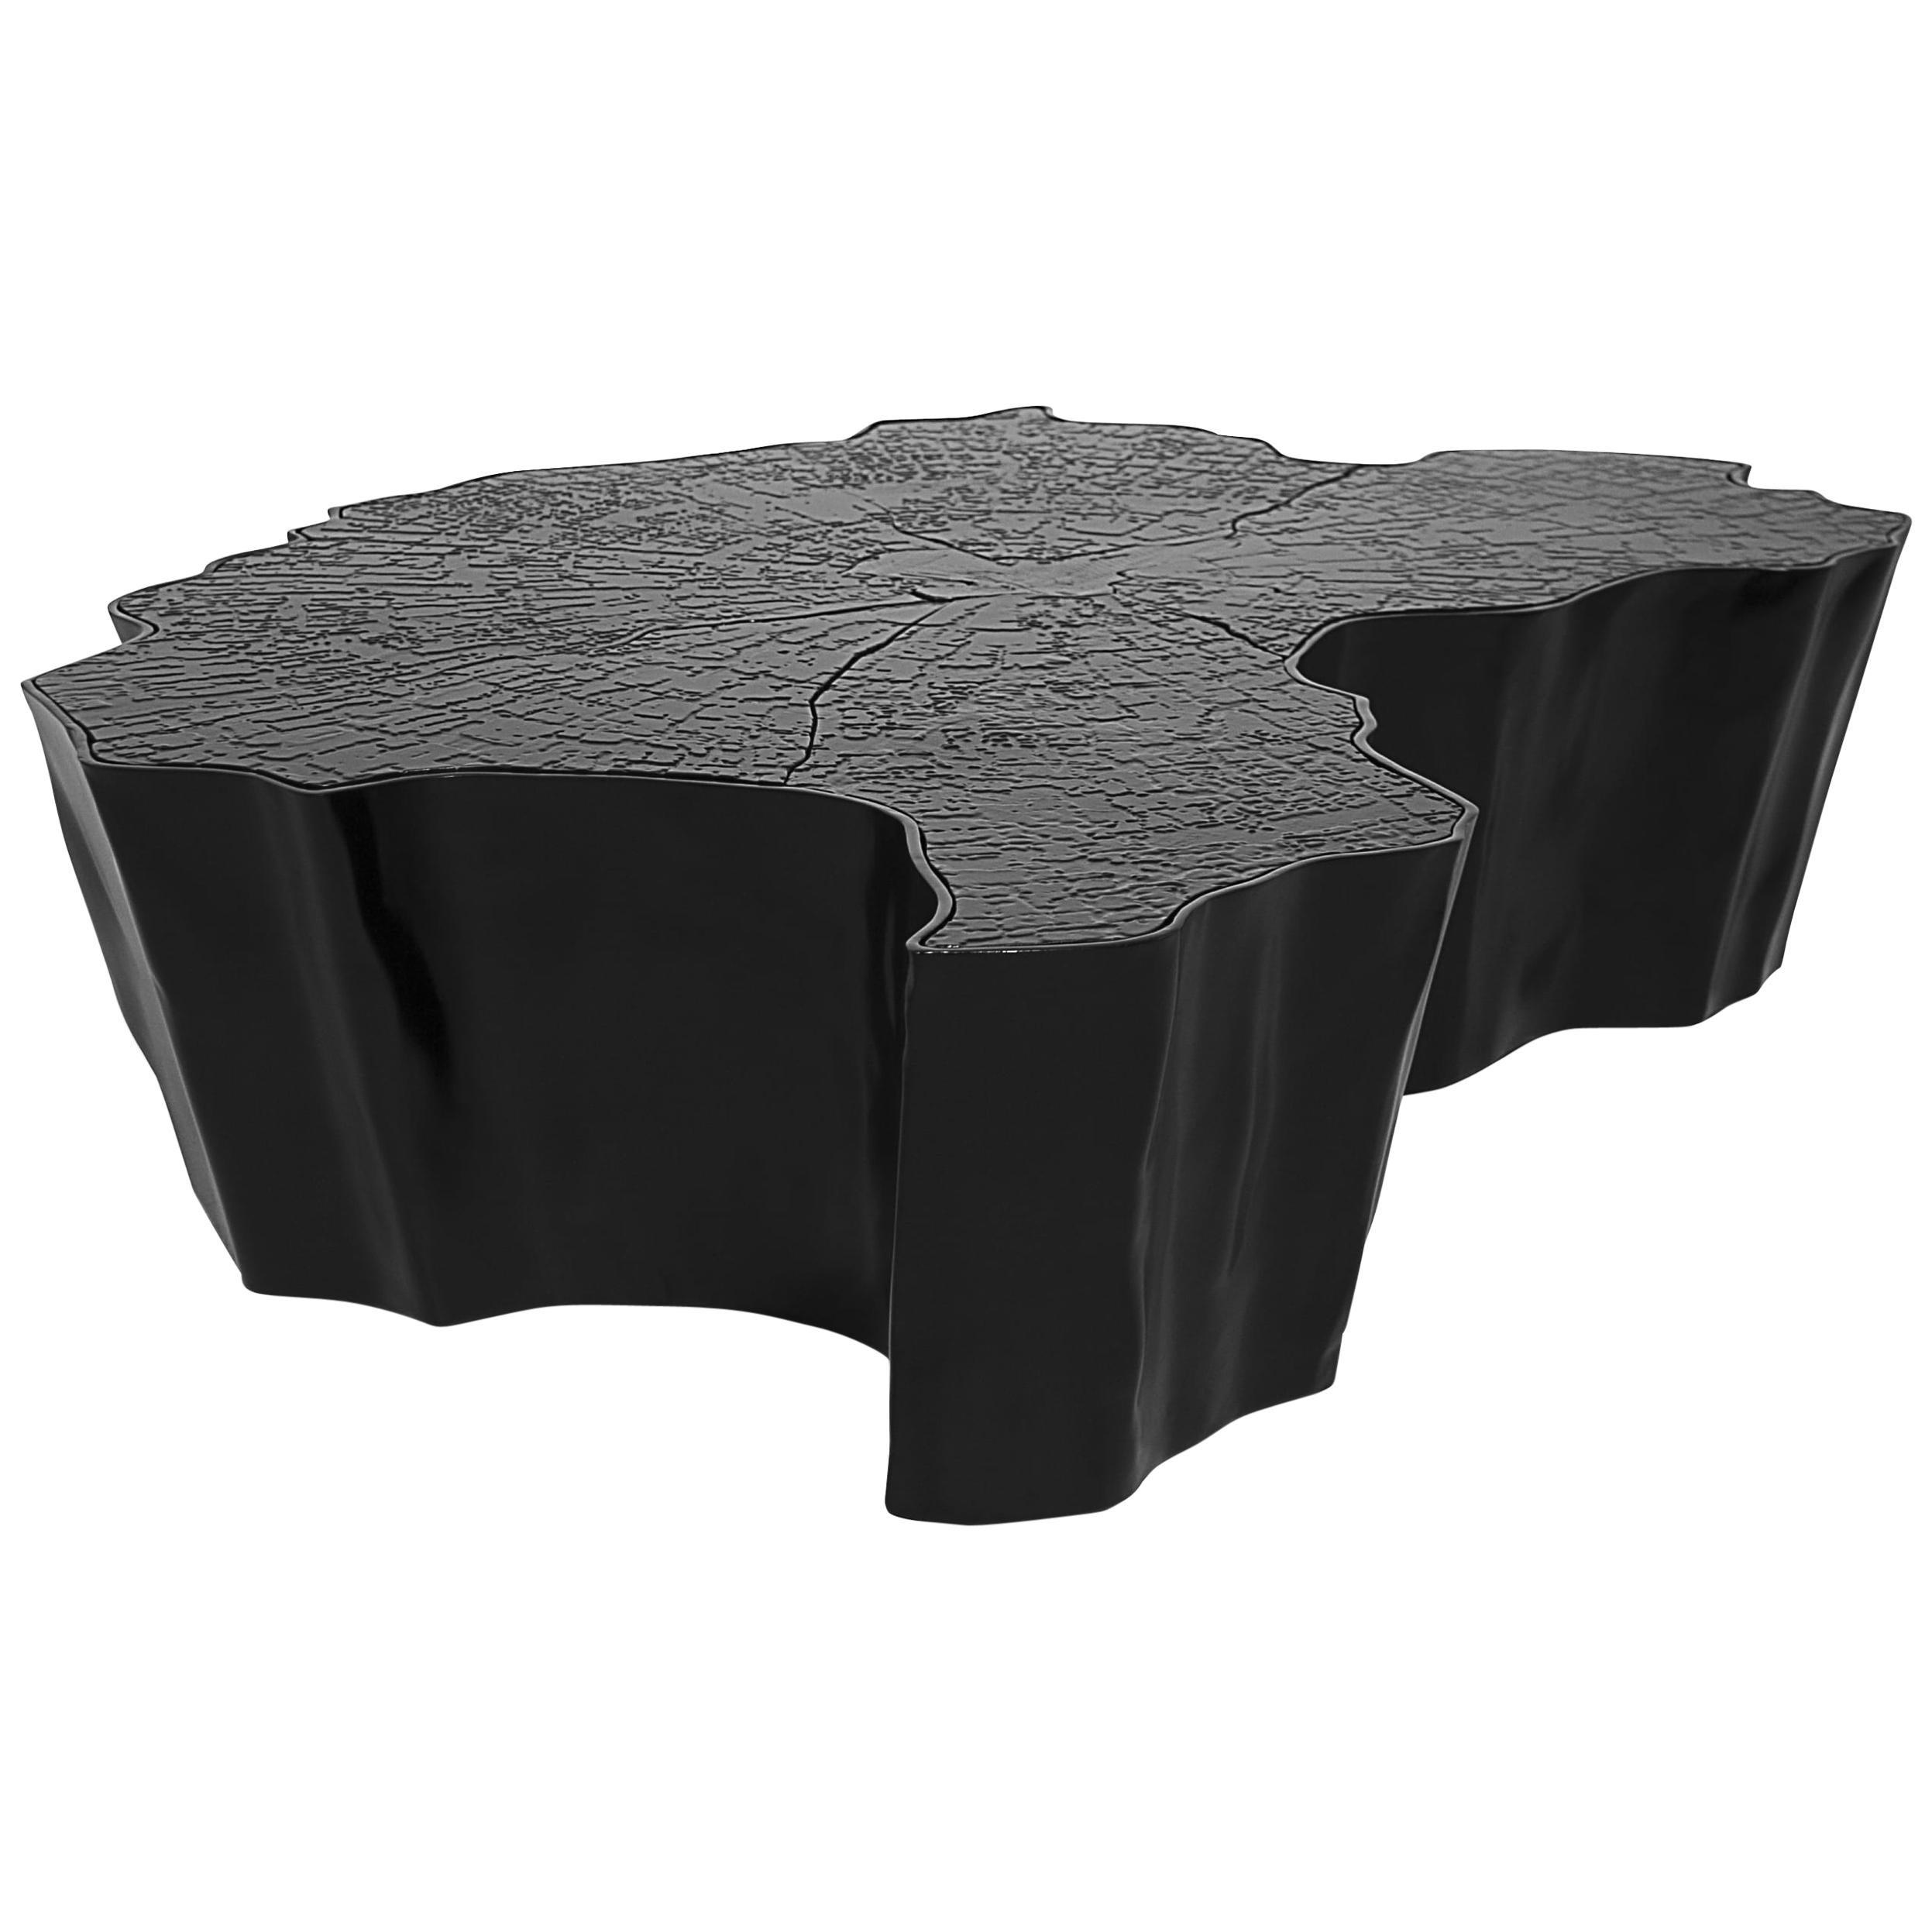 Eden Small Center Table in Black Lacquered Aluminum